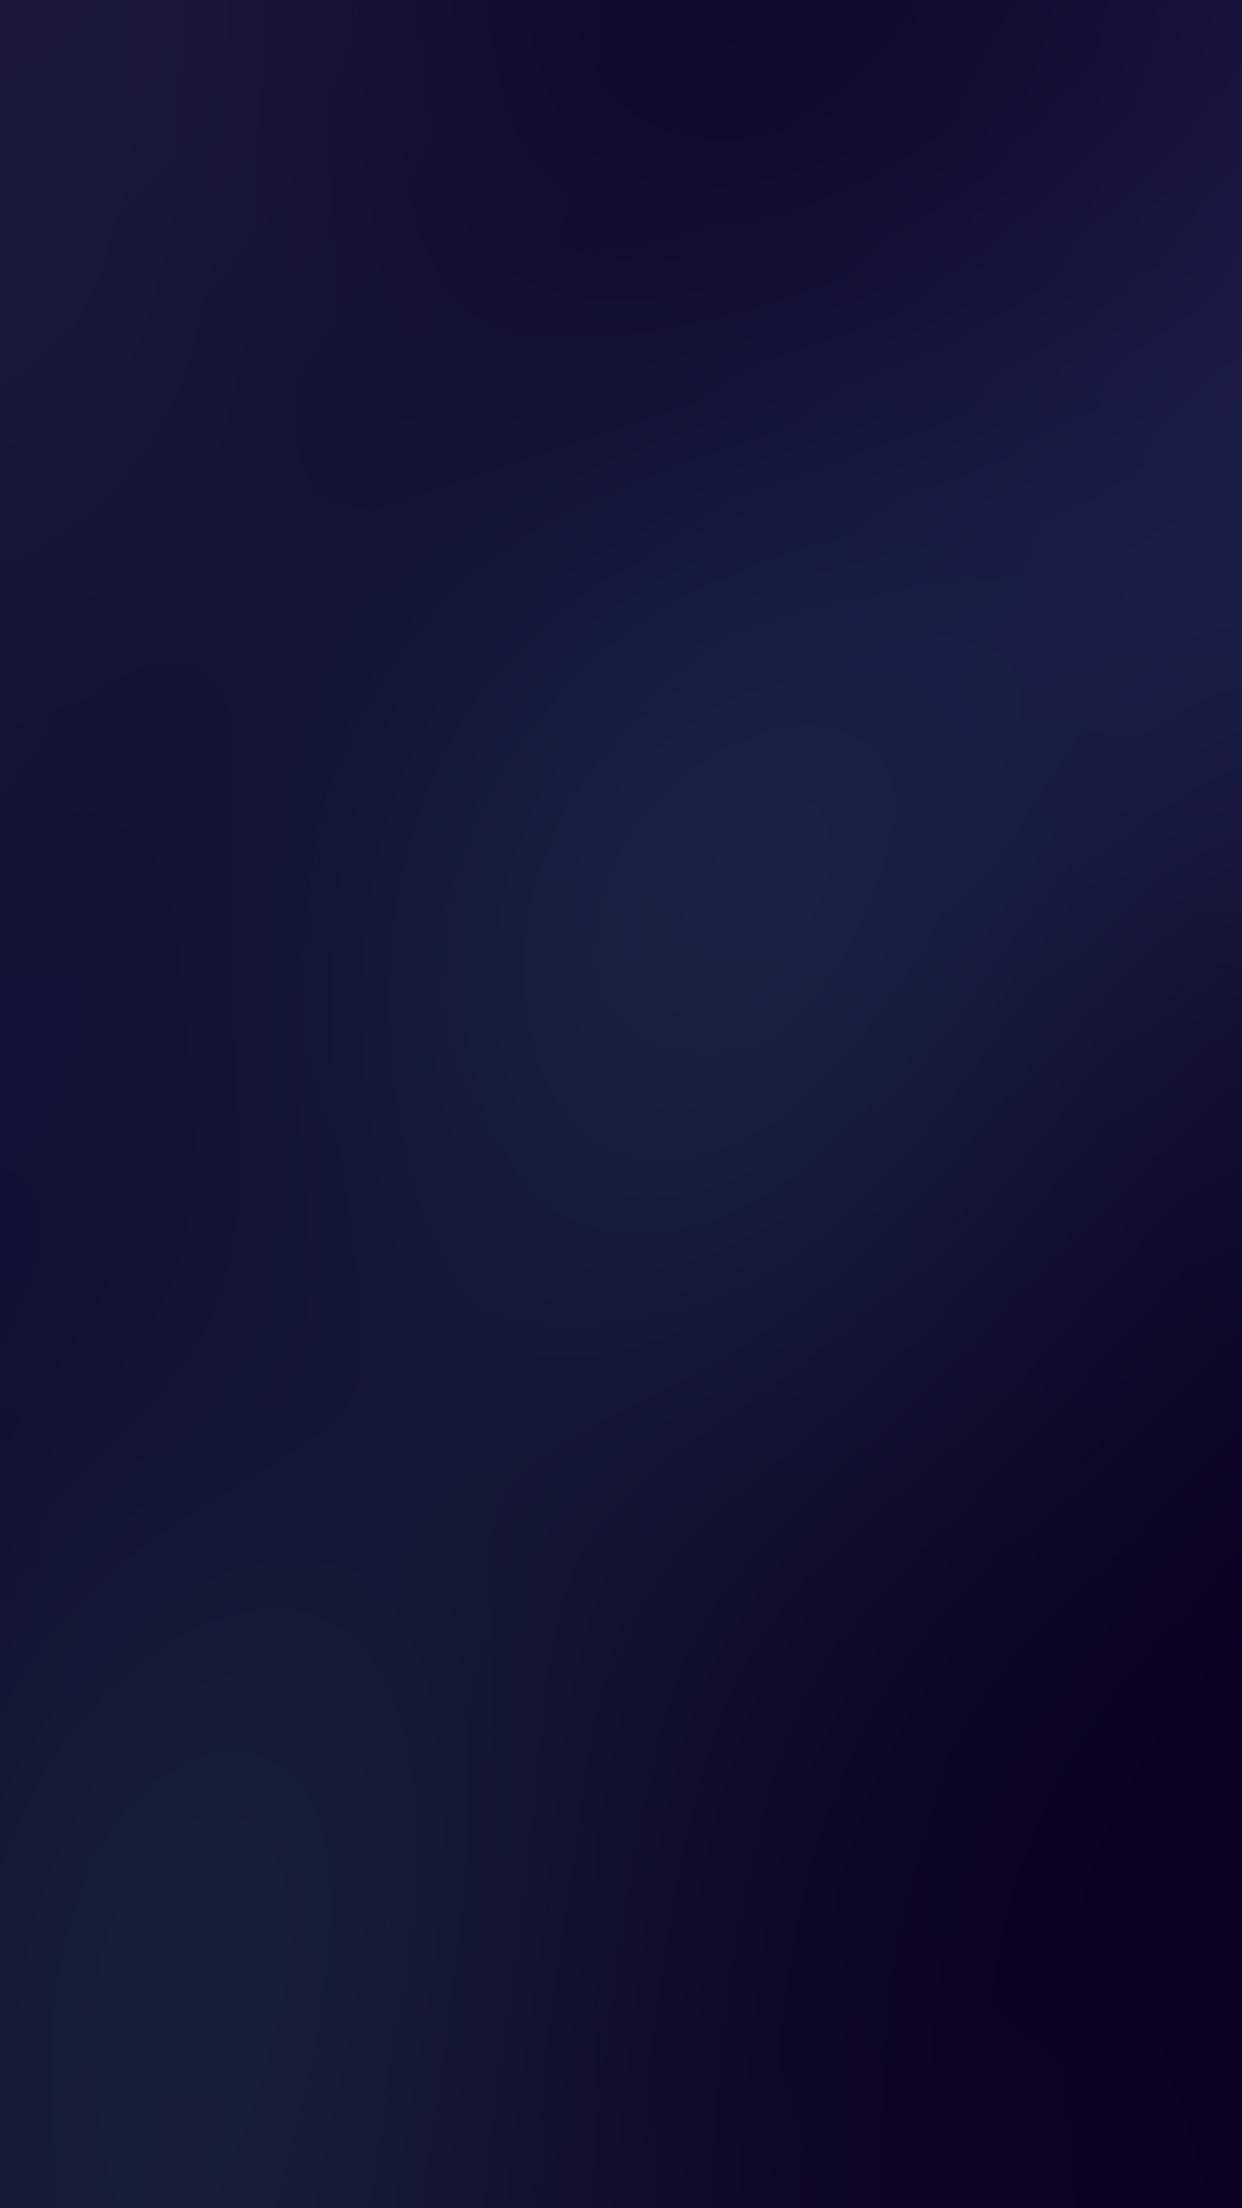 Hatsune Miku Cute Wallpaper Hd Papers Co Iphone Wallpaper Si07 Smoke Blue Dark Sea